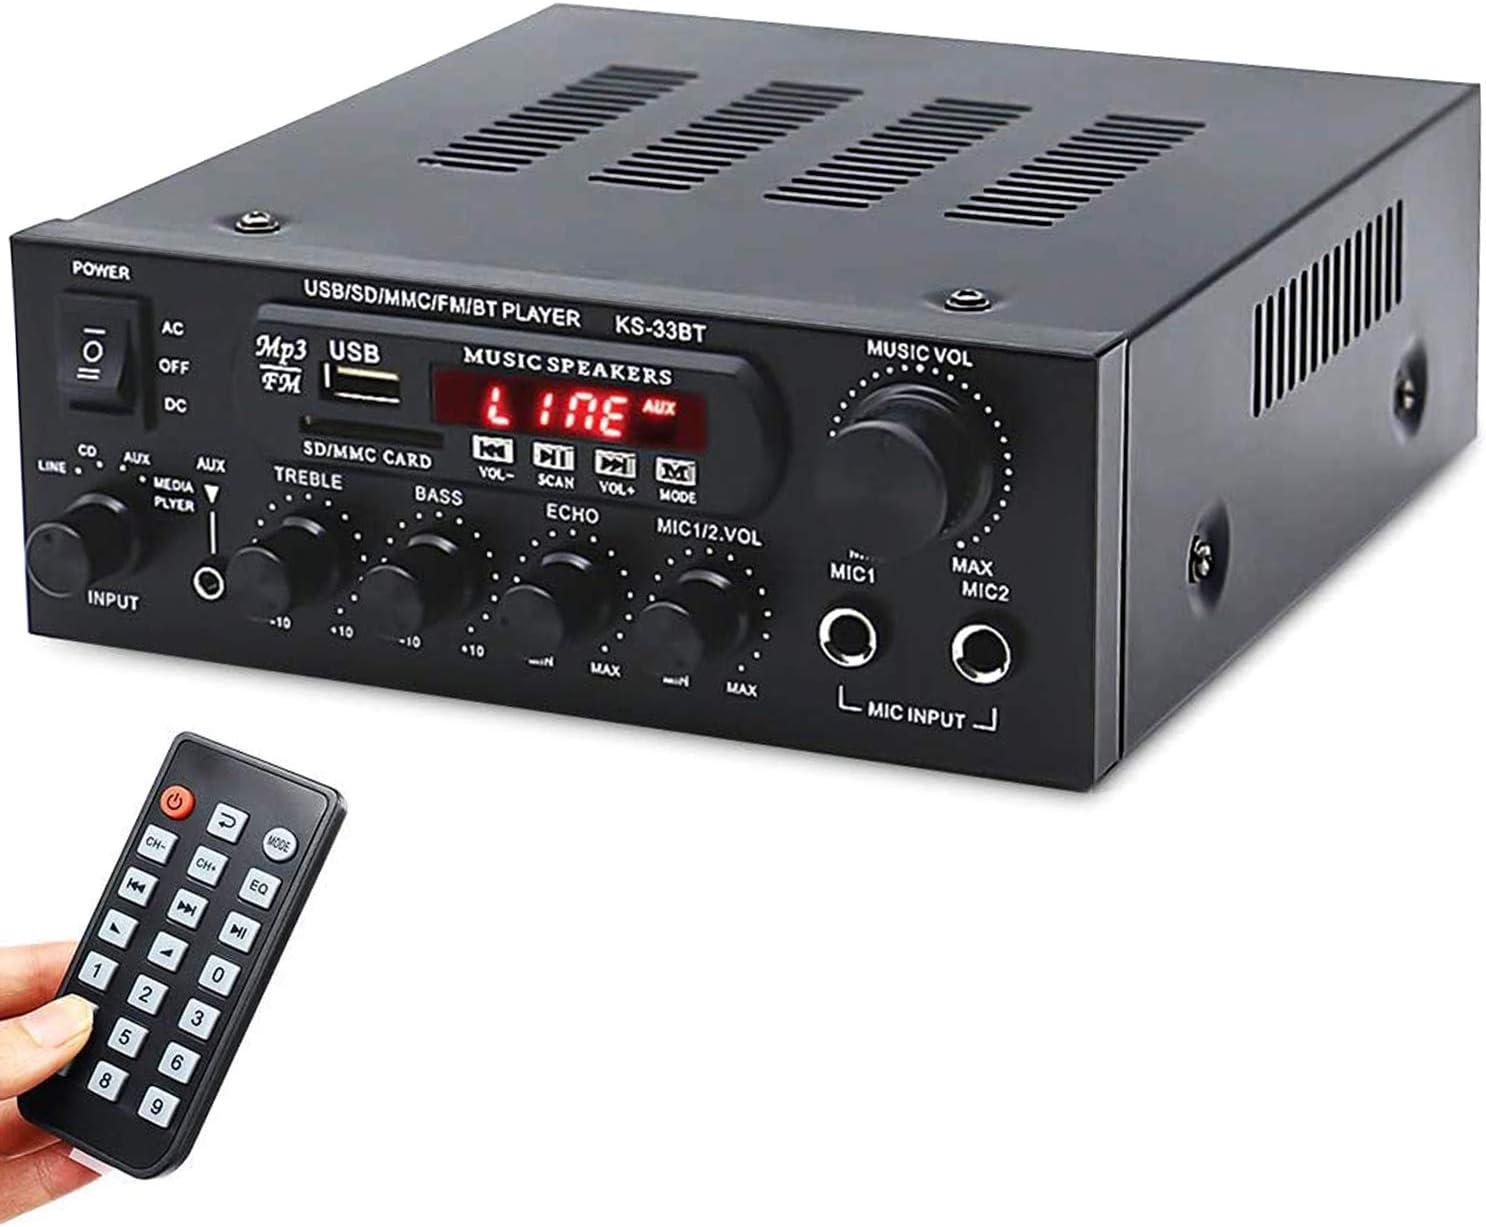 Facmogu KS-33BT 500W+500W 2CH Bluetooth Power Amplifier, 2xMic Input Digital Audio Player Home Stereo HIFI USB Memory Card Aux FM AMP 110V